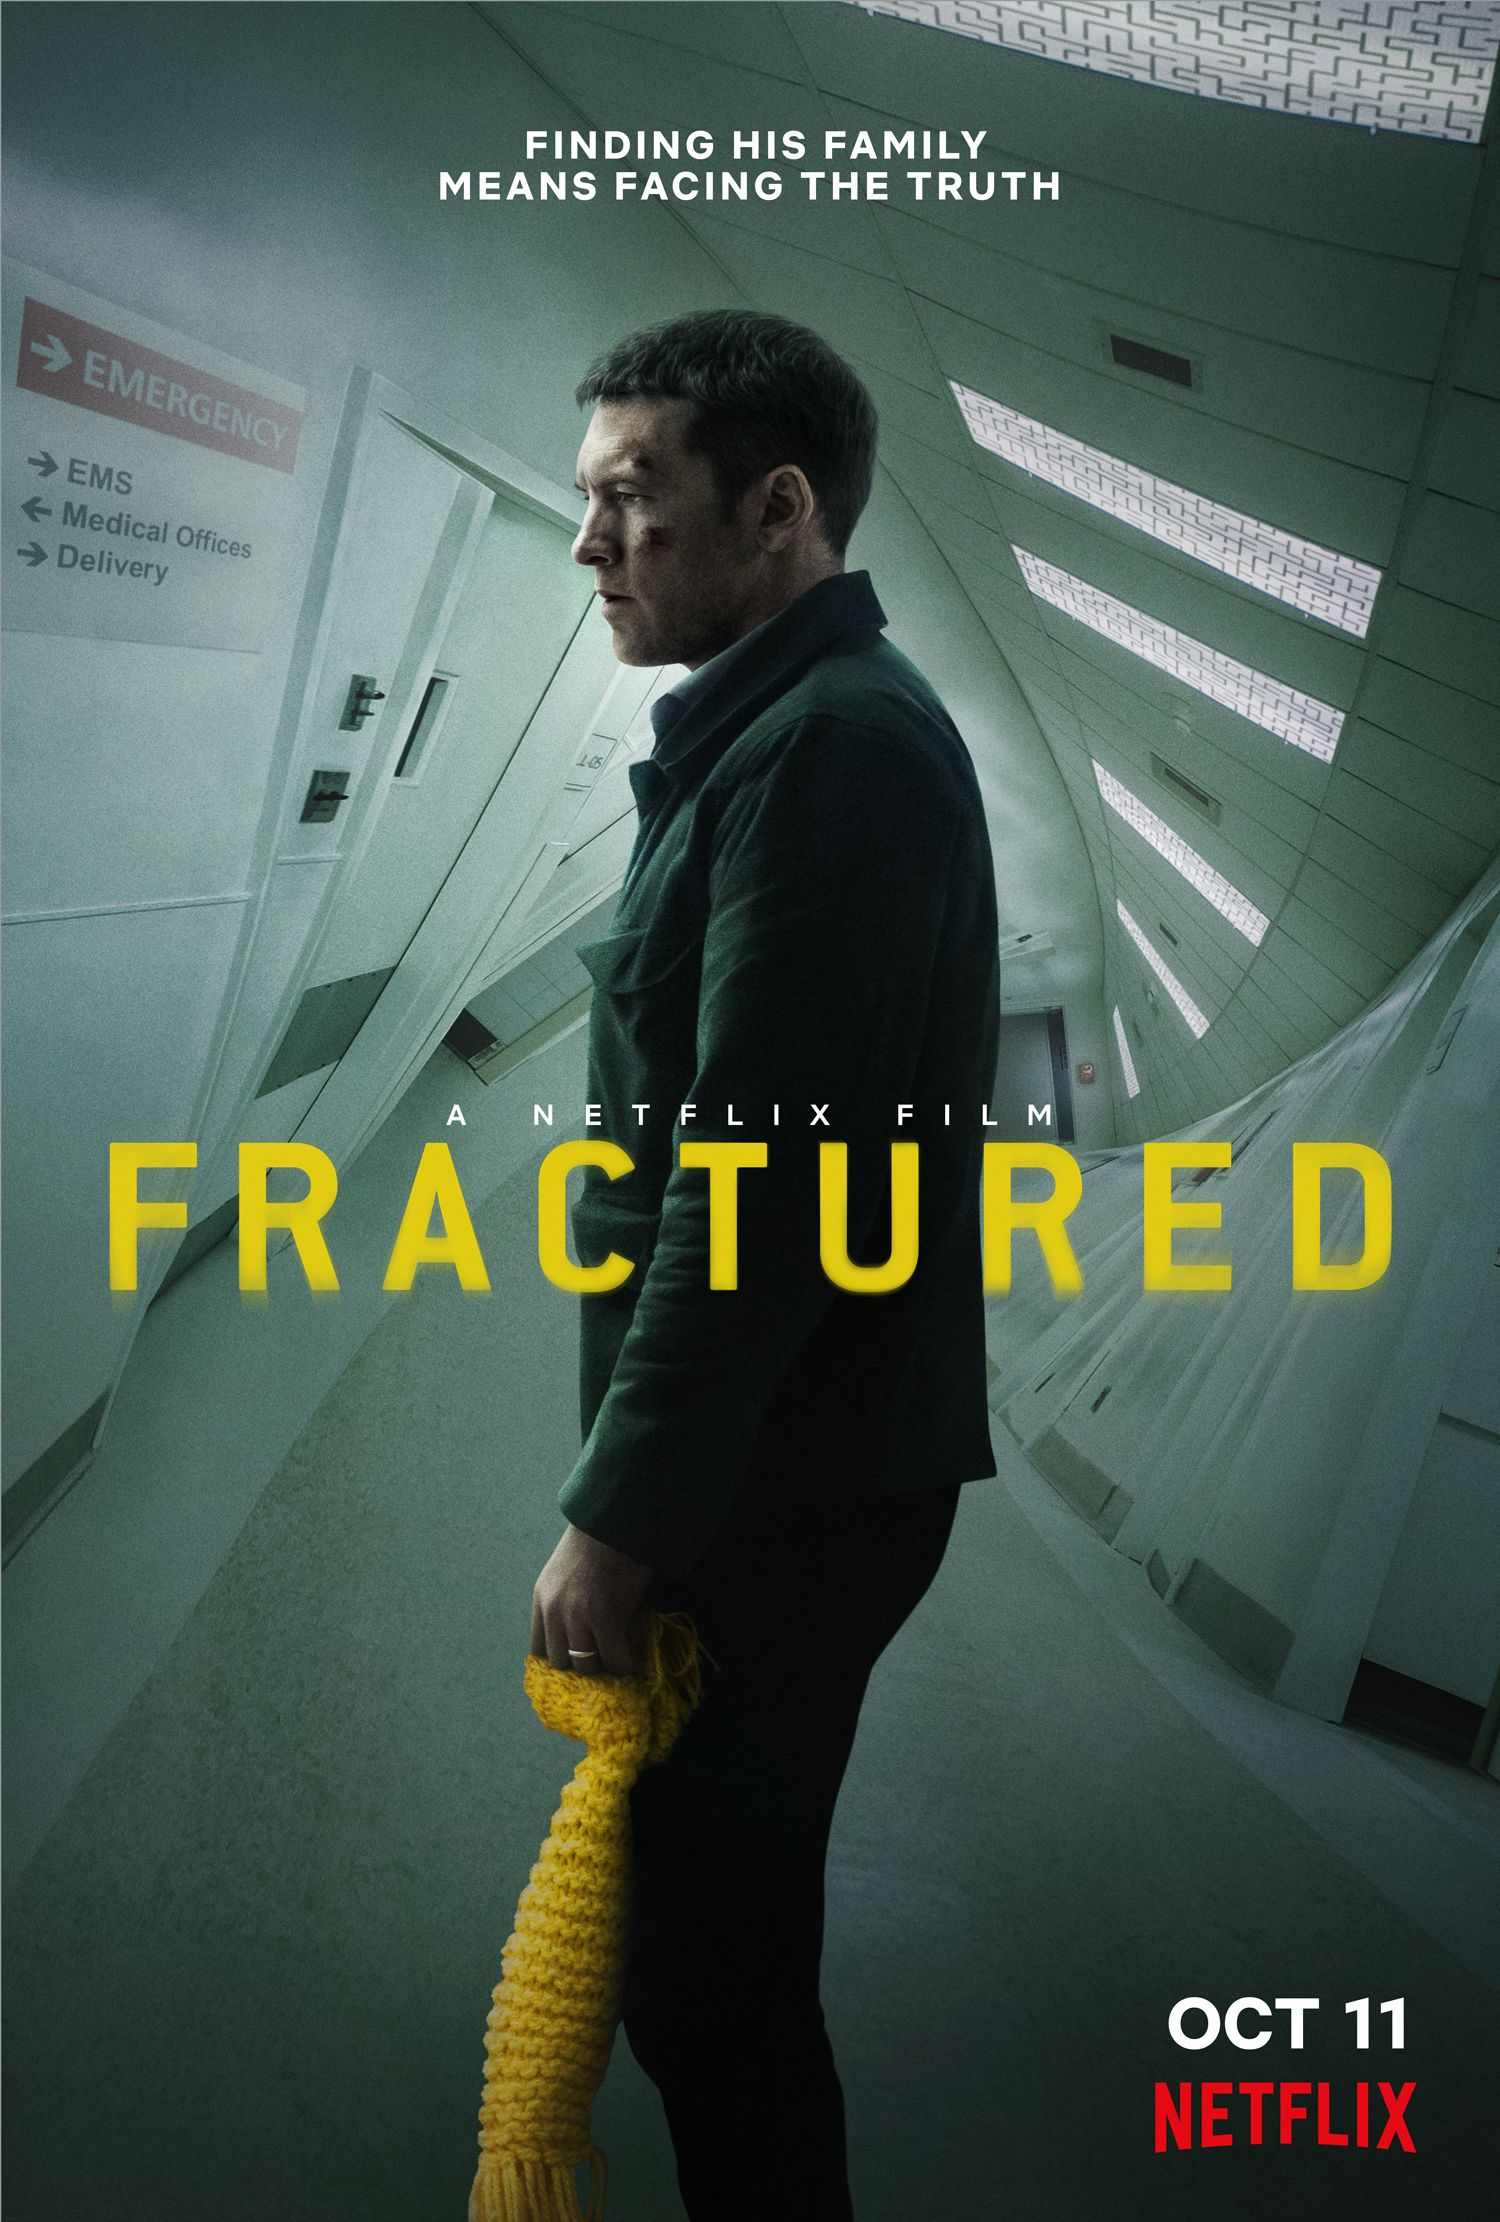 Netflix Fractured